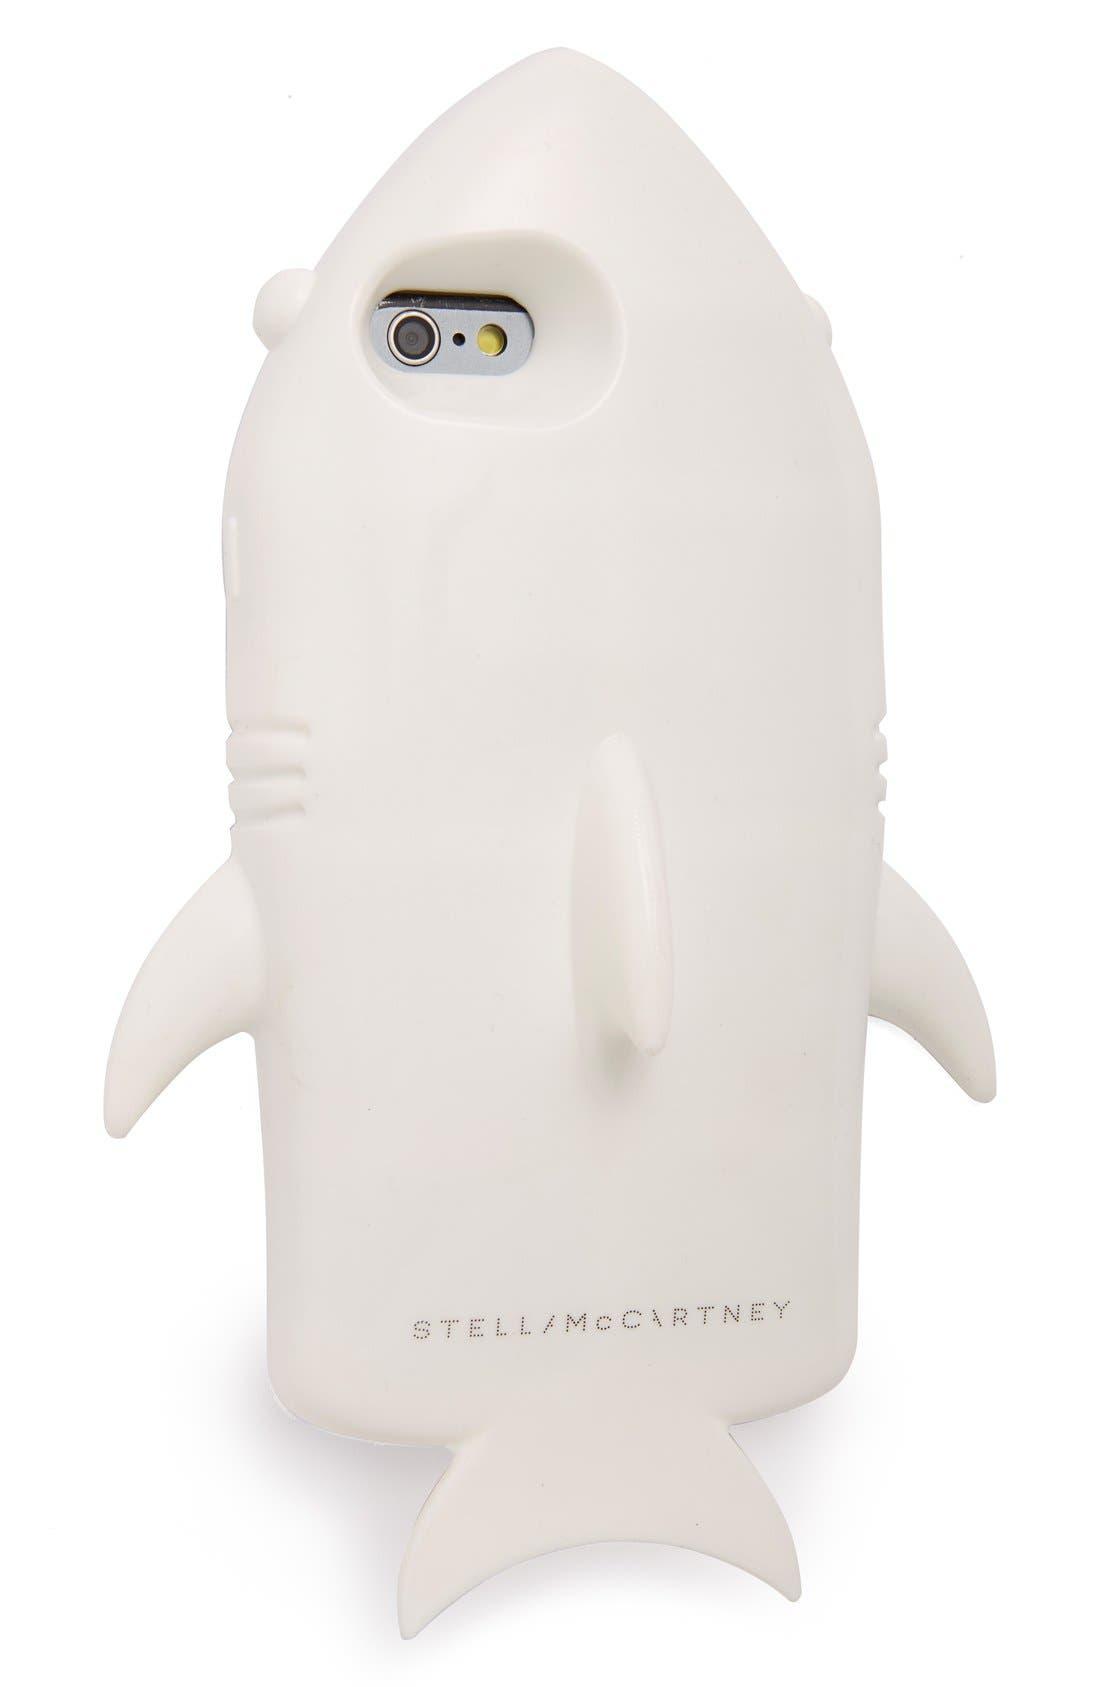 Alternate Image 1 Selected - Stella McCartney 'Shark' iPhone 6 & 6s Case